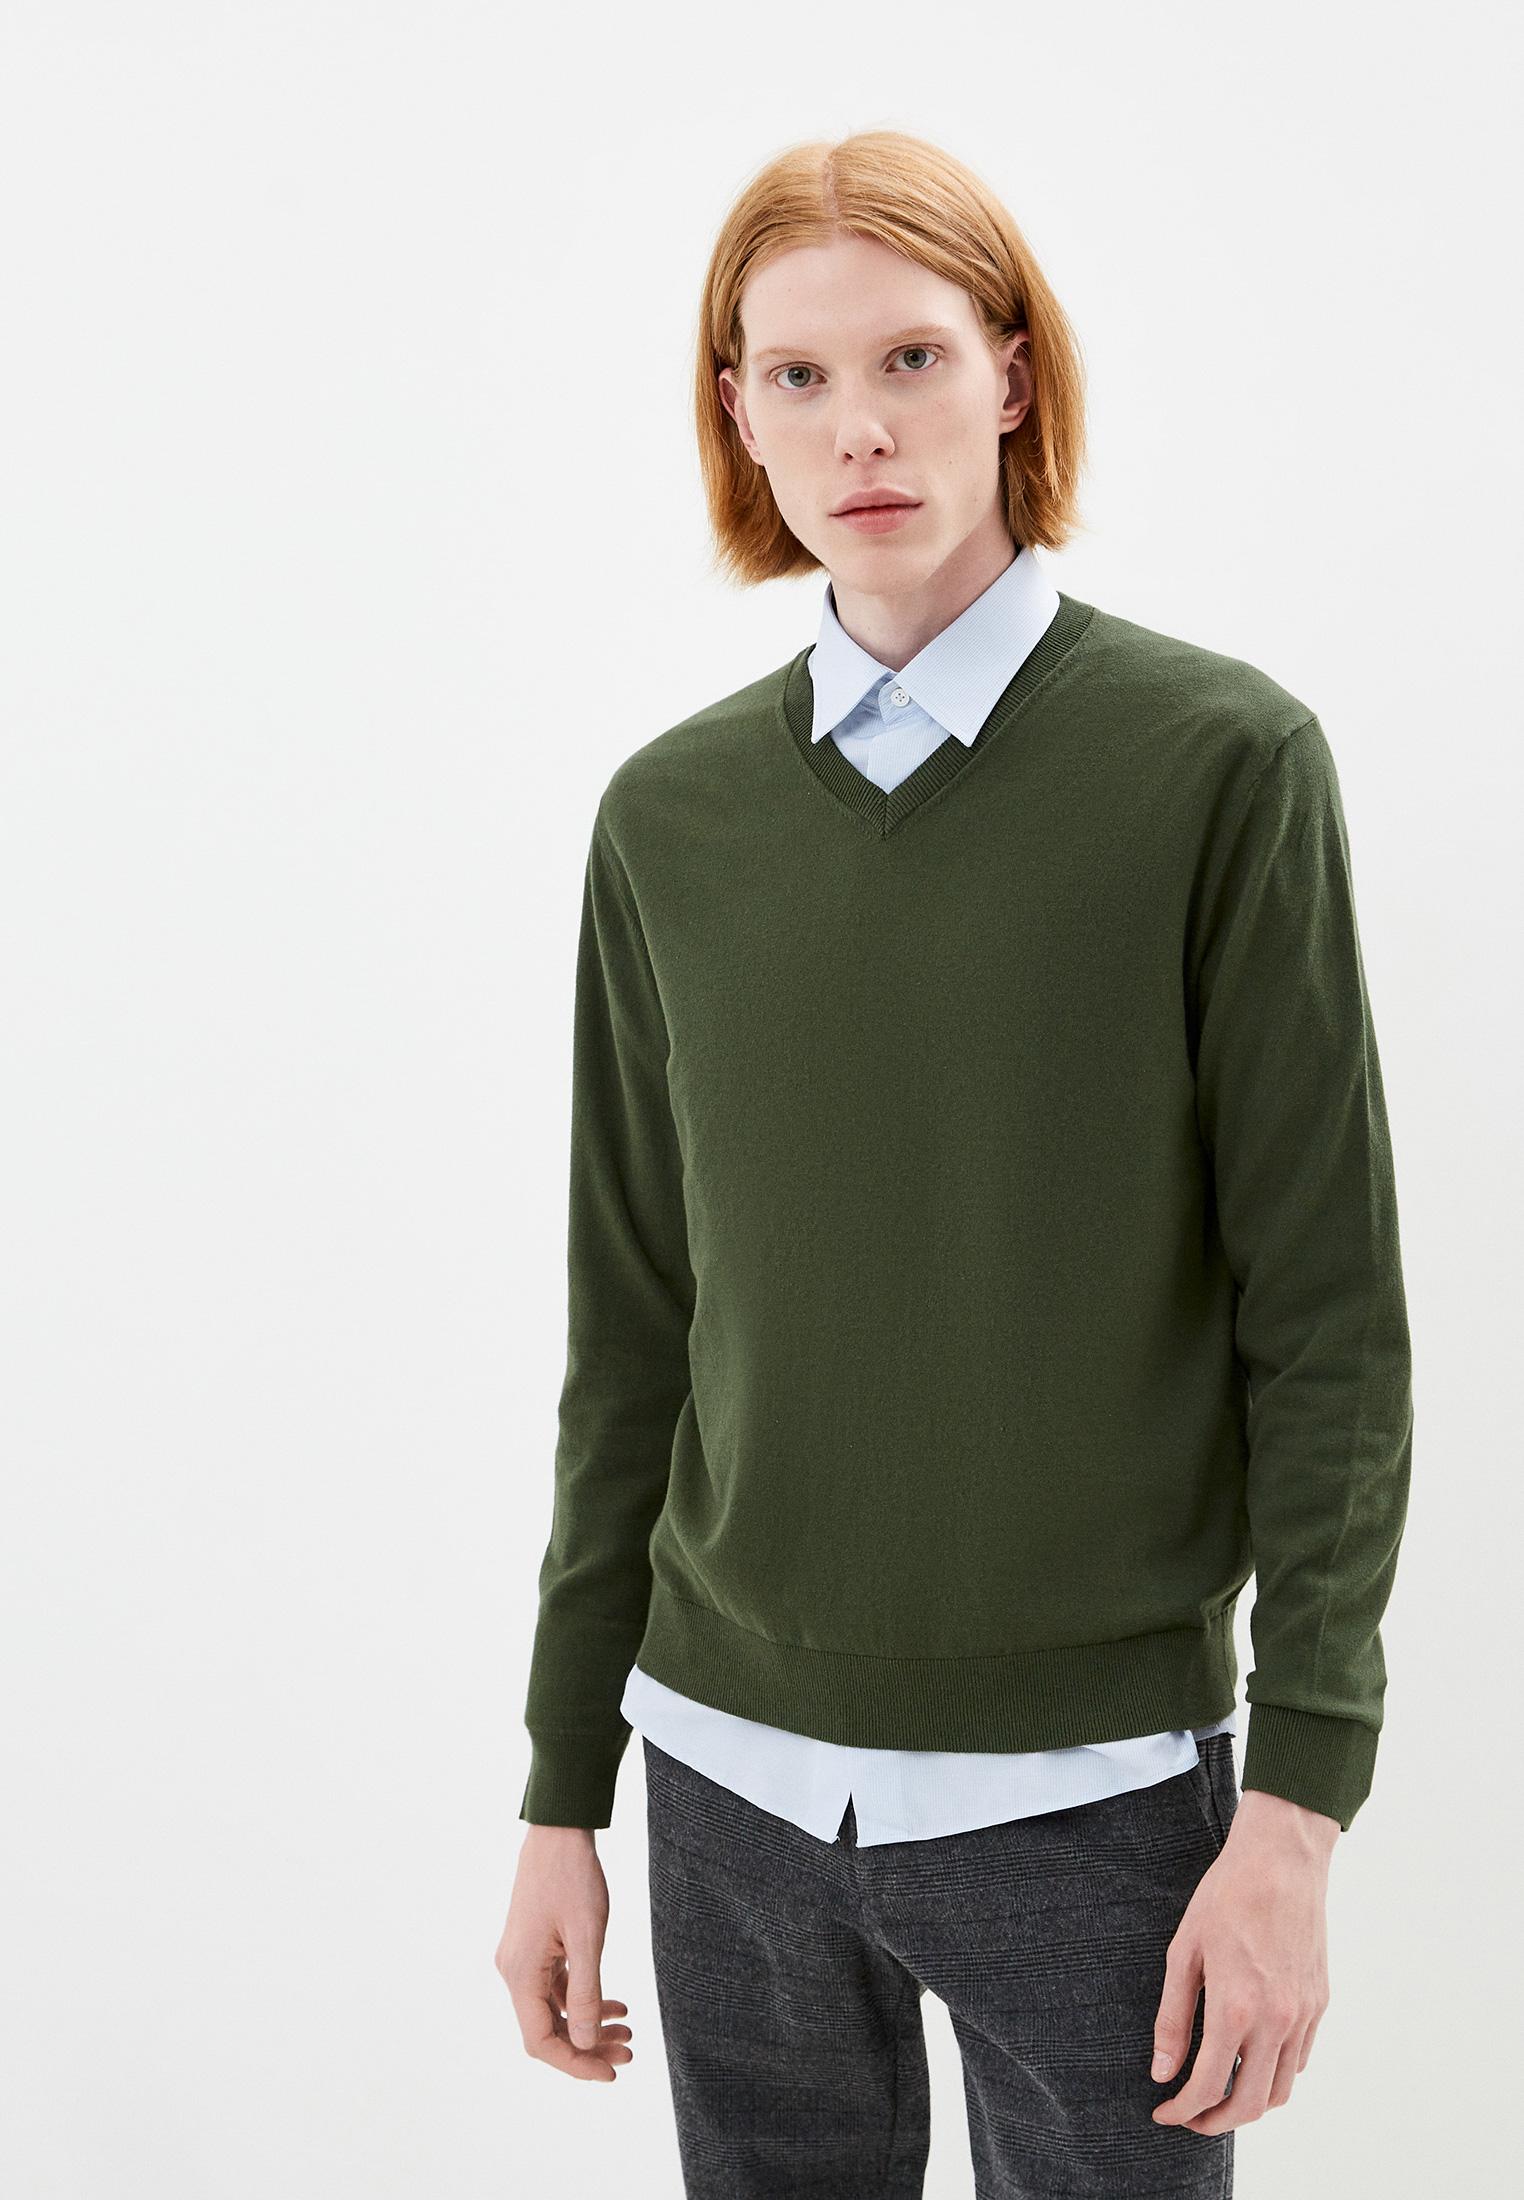 Пуловер United Colors of Benetton (Юнайтед Колорс оф Бенеттон) Пуловер United Colors of Benetton